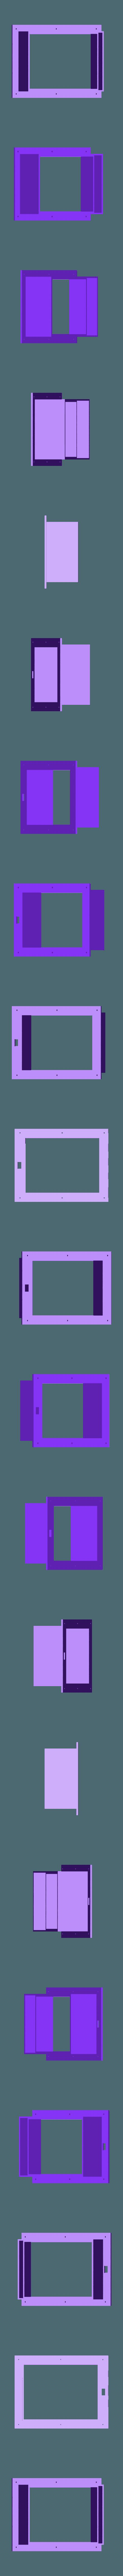 KatzenklappeTeil2.stl Download free STL file Cat Flap Automatic Door • 3D printing model, Edd77